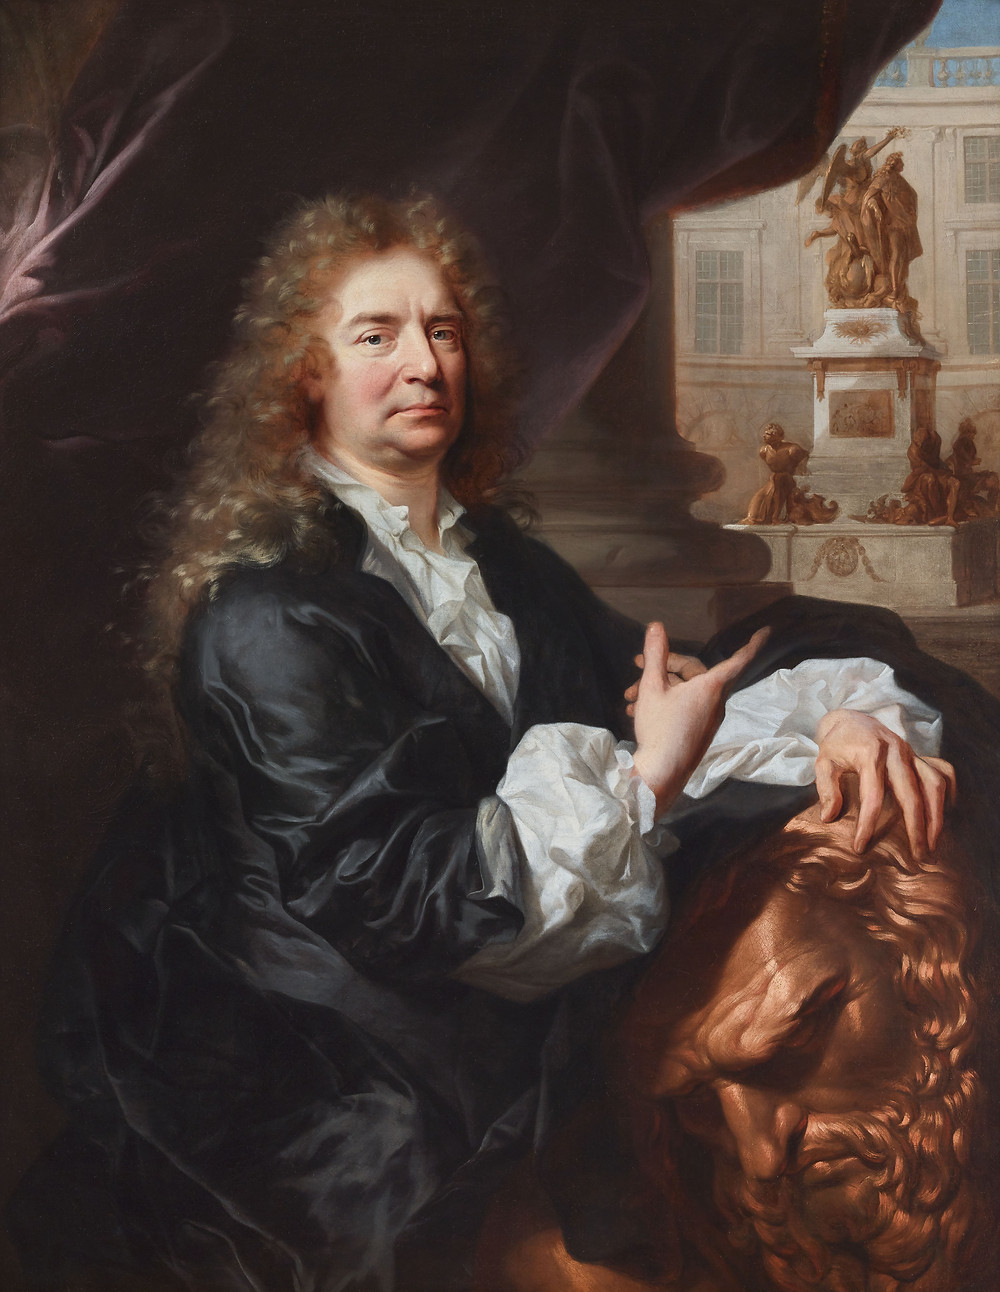 Hyacinthe Rigaud, Portrait du sculpteurMartin van den Bogaert dit Desjardins, vers 1686, Paris, Galerie Didier Aaron